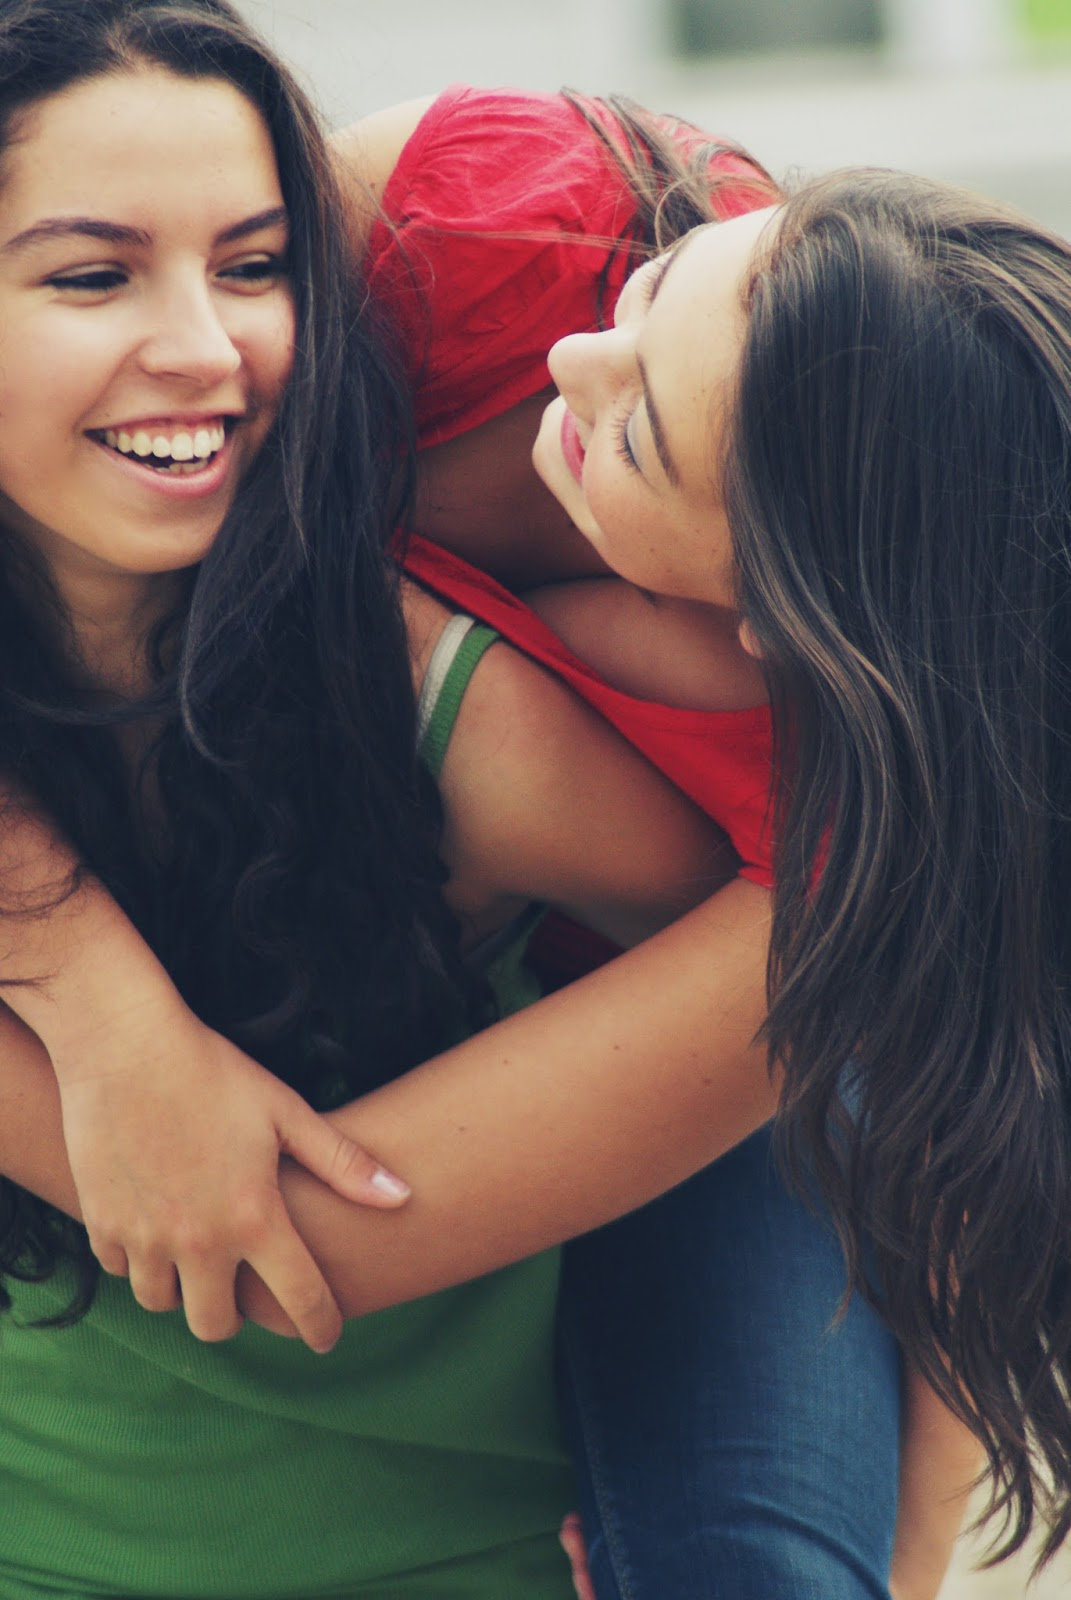 friendship, friendship photoshoots, ideas for photoshoots, how to photograph best friends, best friends photoshoot, girlfriends photoshoot, how to get the best images, friendship shoot ideas, friendship photo shoot,